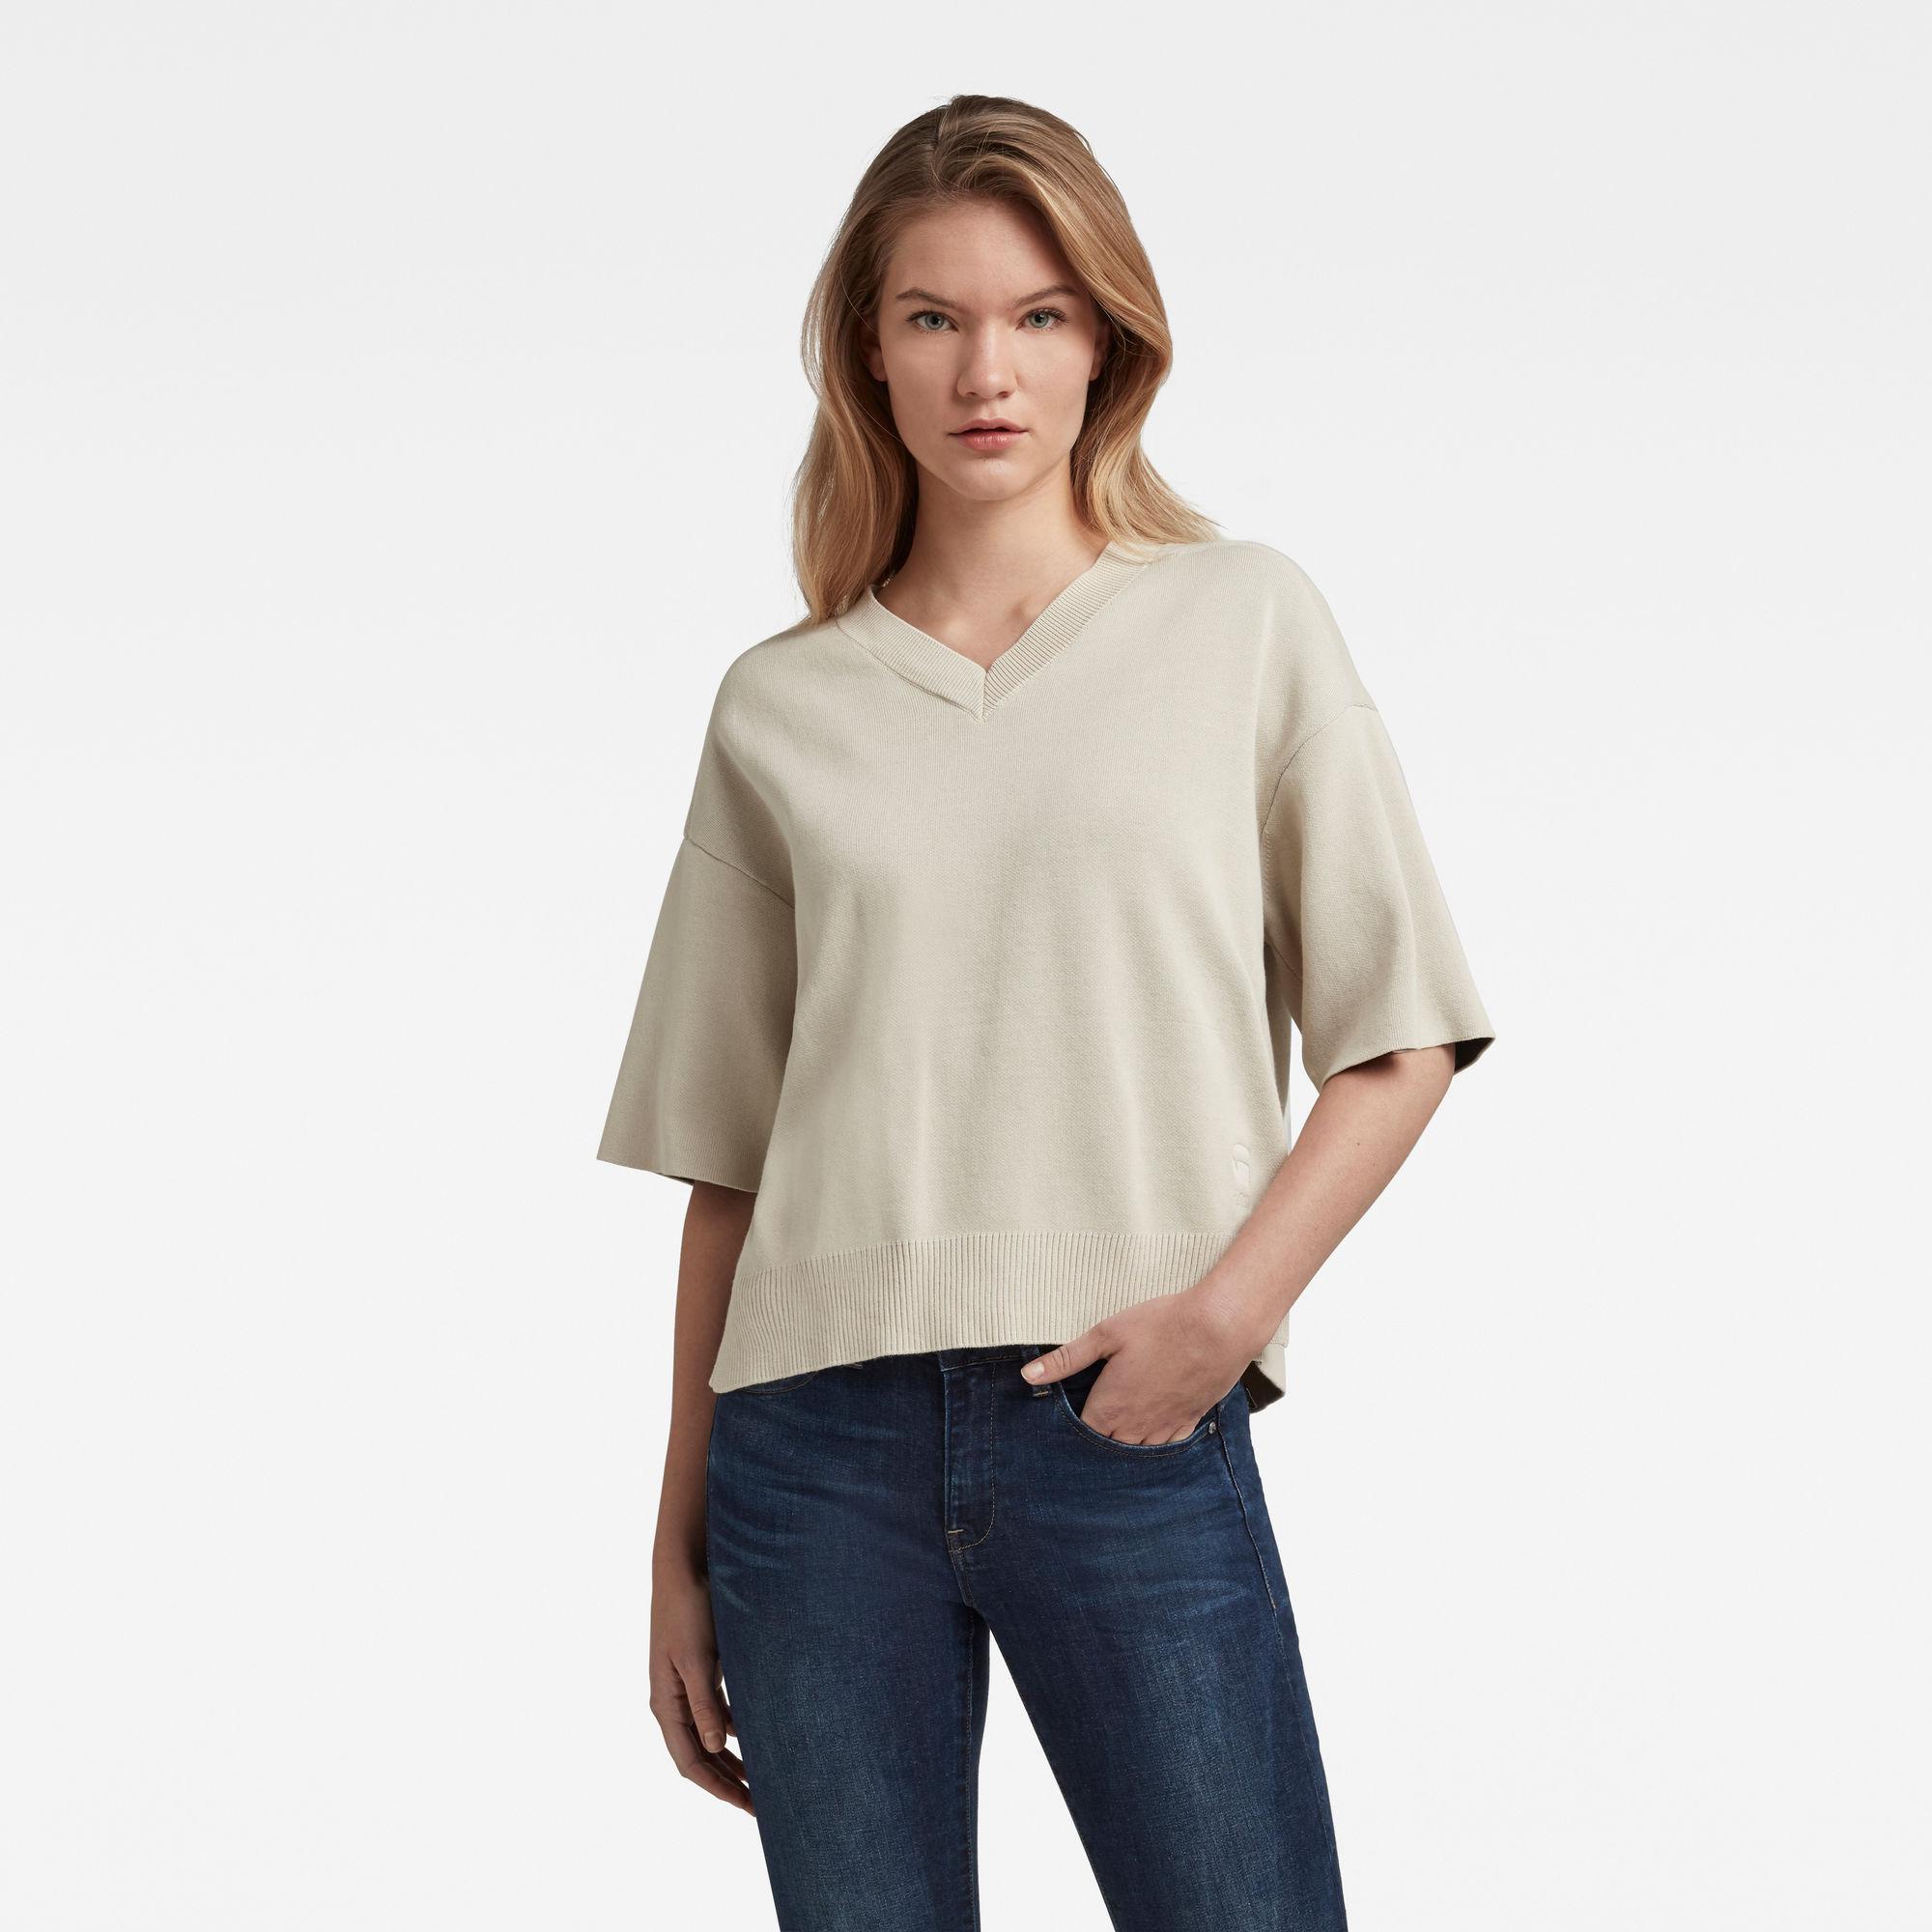 G-Star RAW Dames Gebreid T-Shirt Met V-Hals Beige